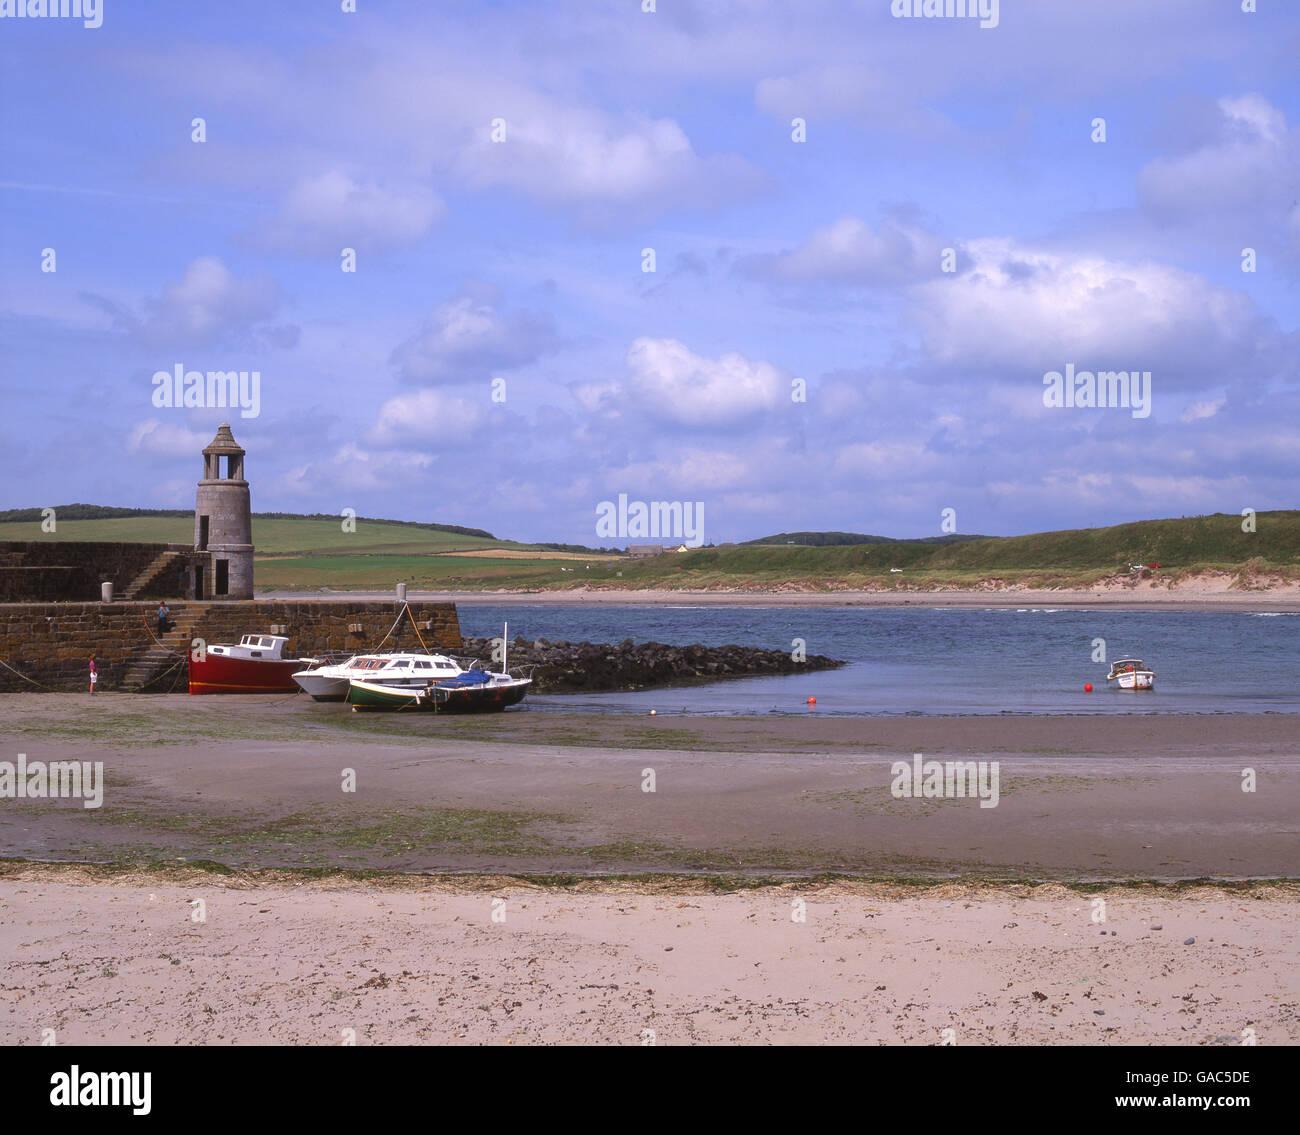 Port Logan, Rhins of Galloway, S/W Scotland. - Stock Image